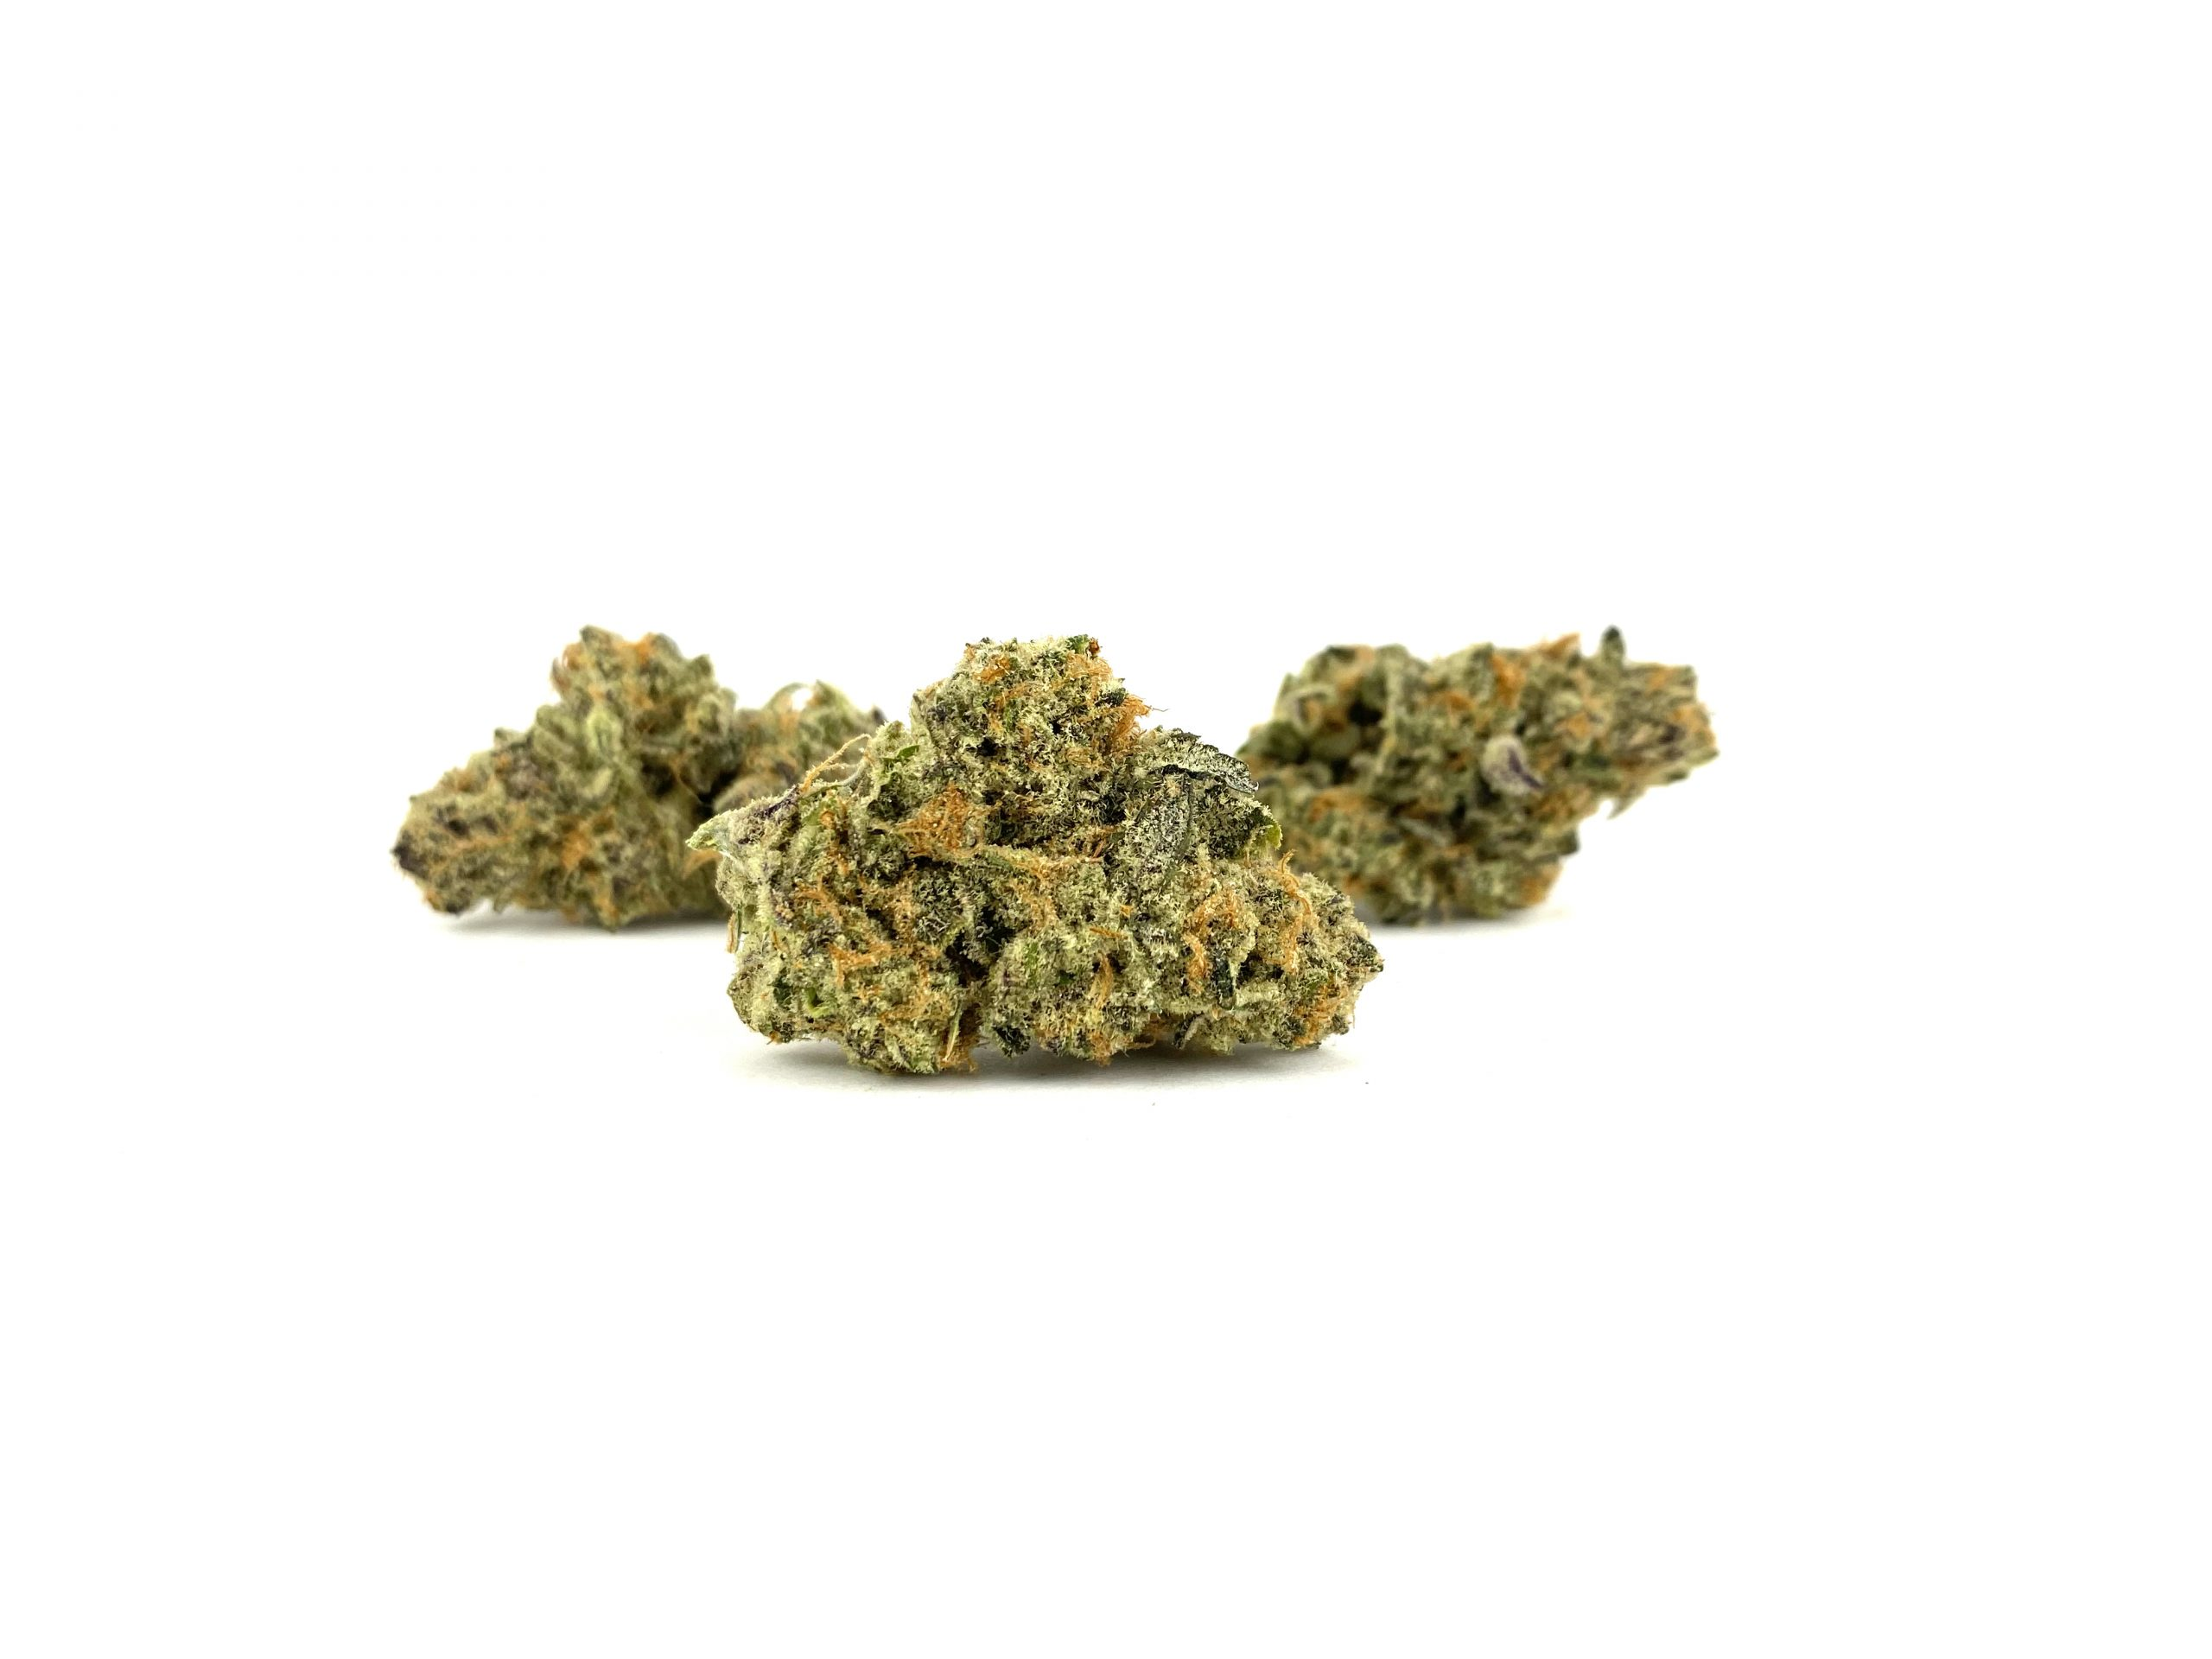 Tartpops Cannabis Product